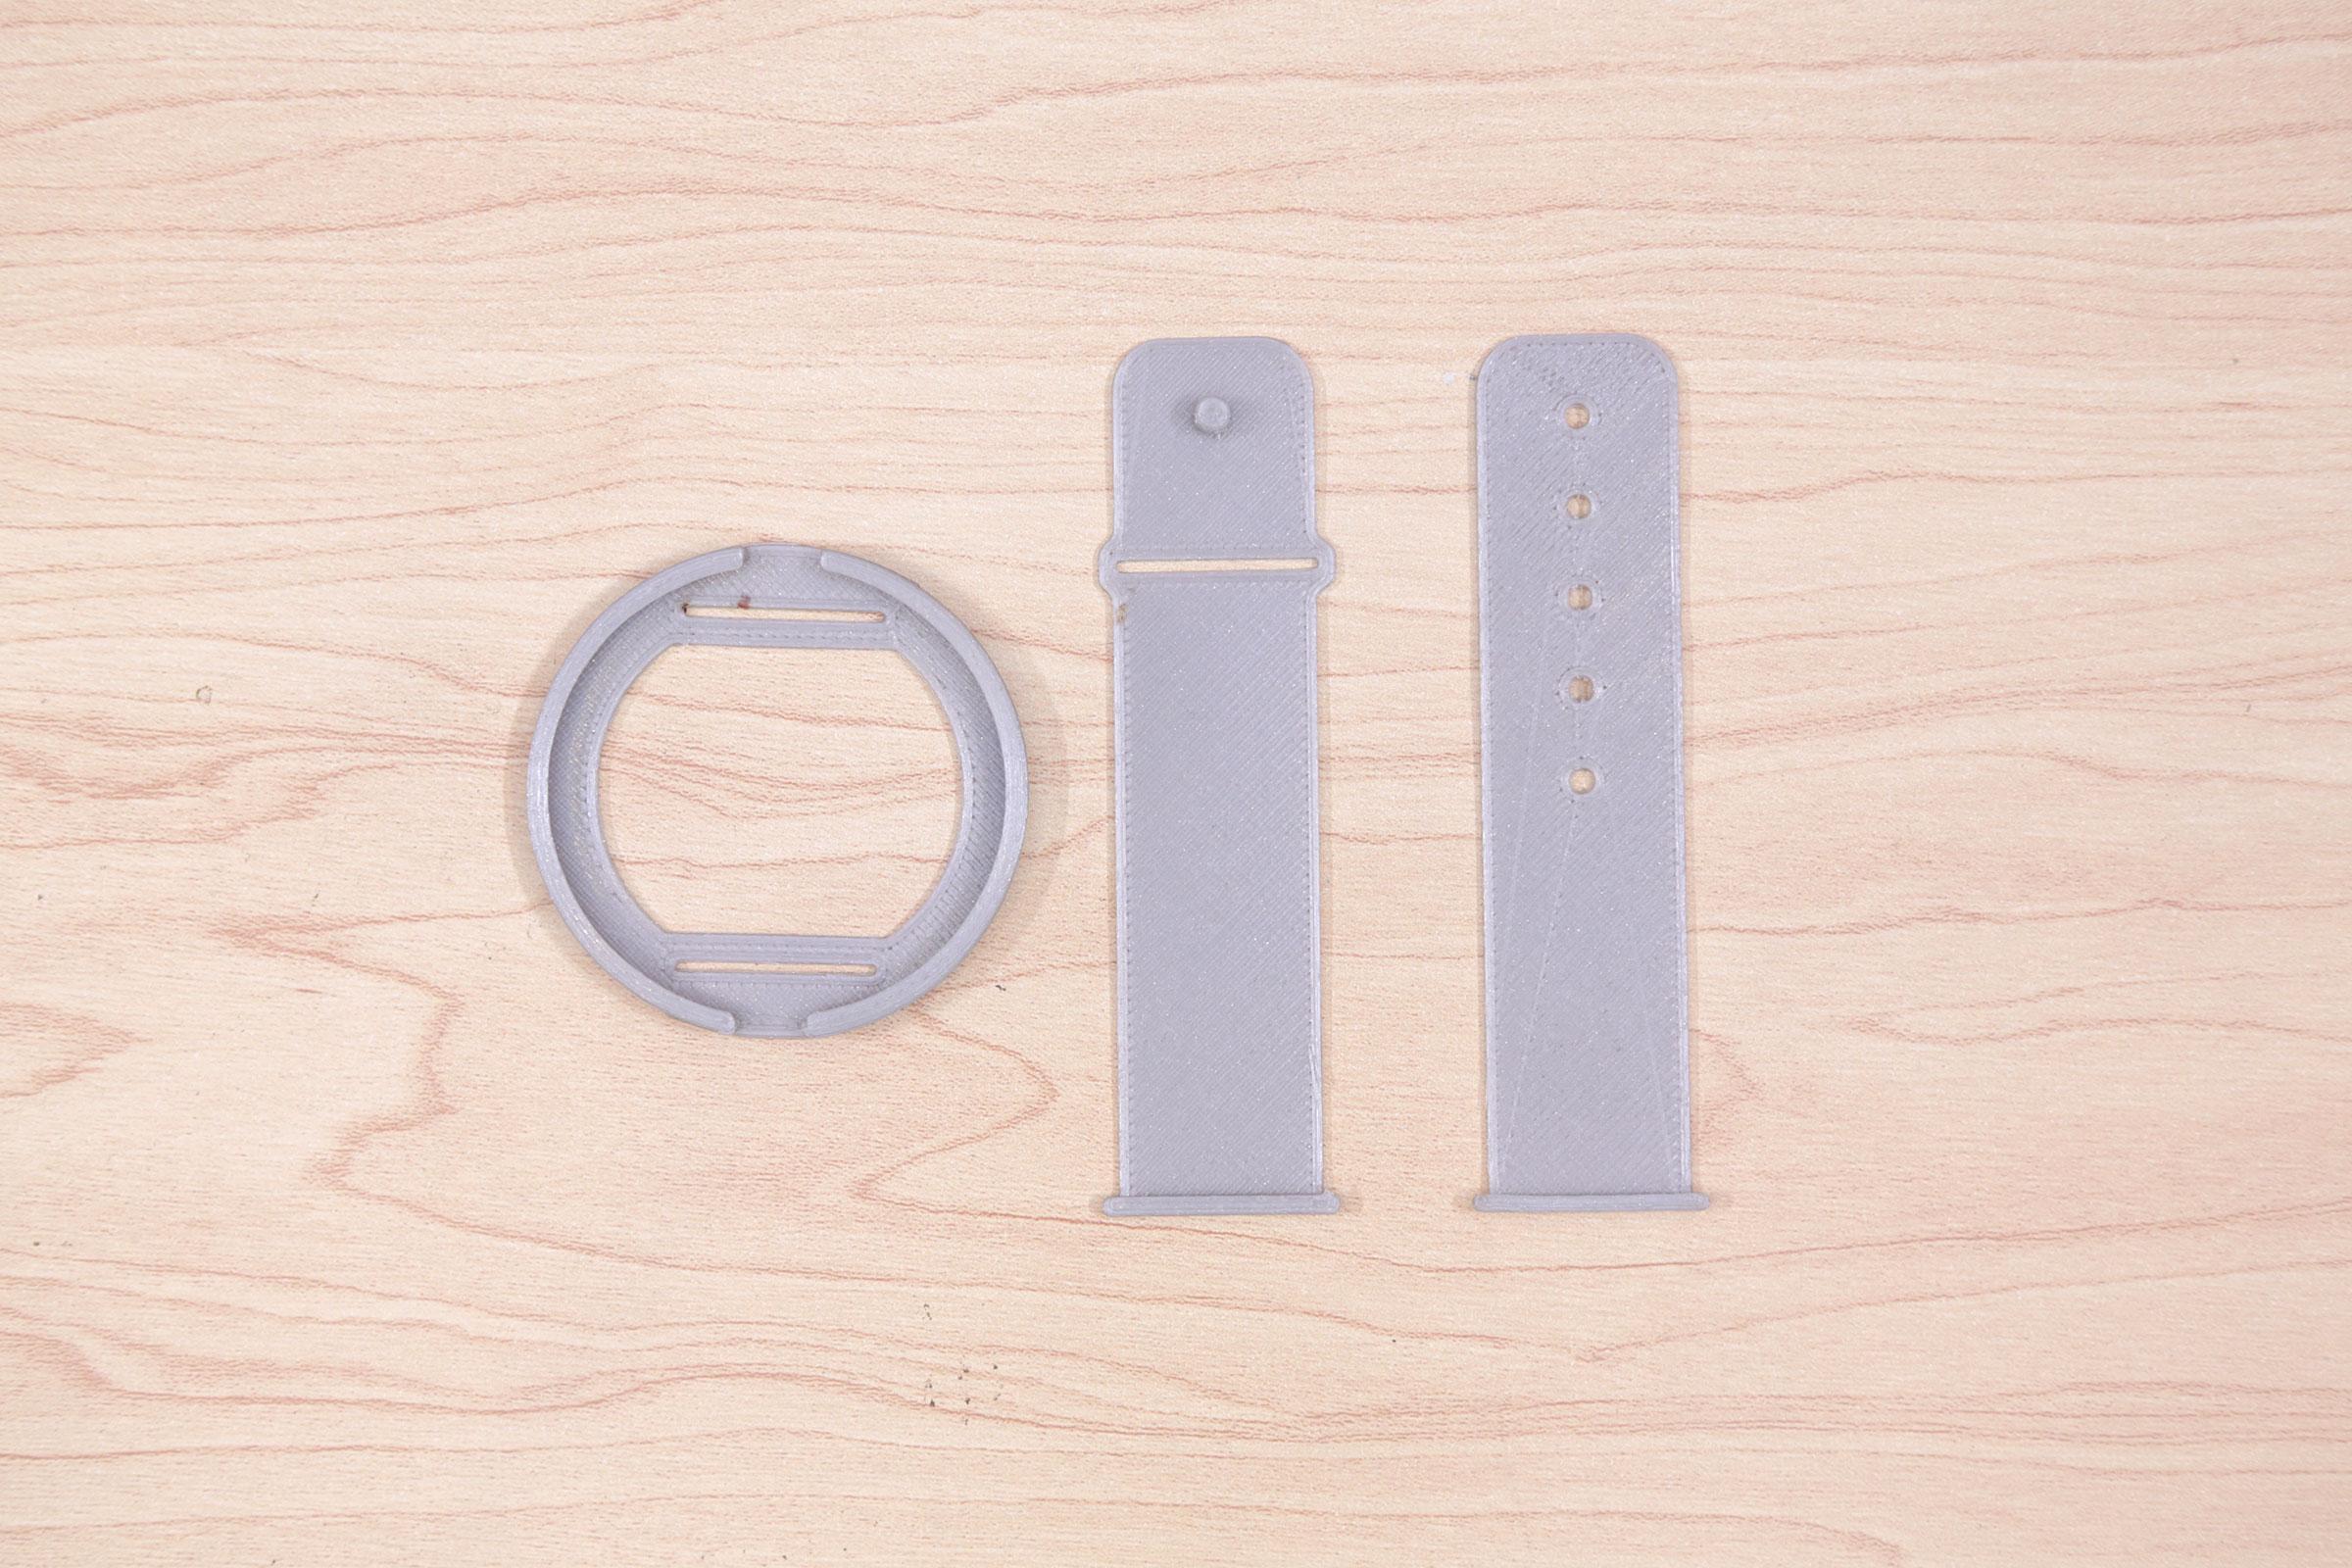 circuit_playground_printed-parts.jpg